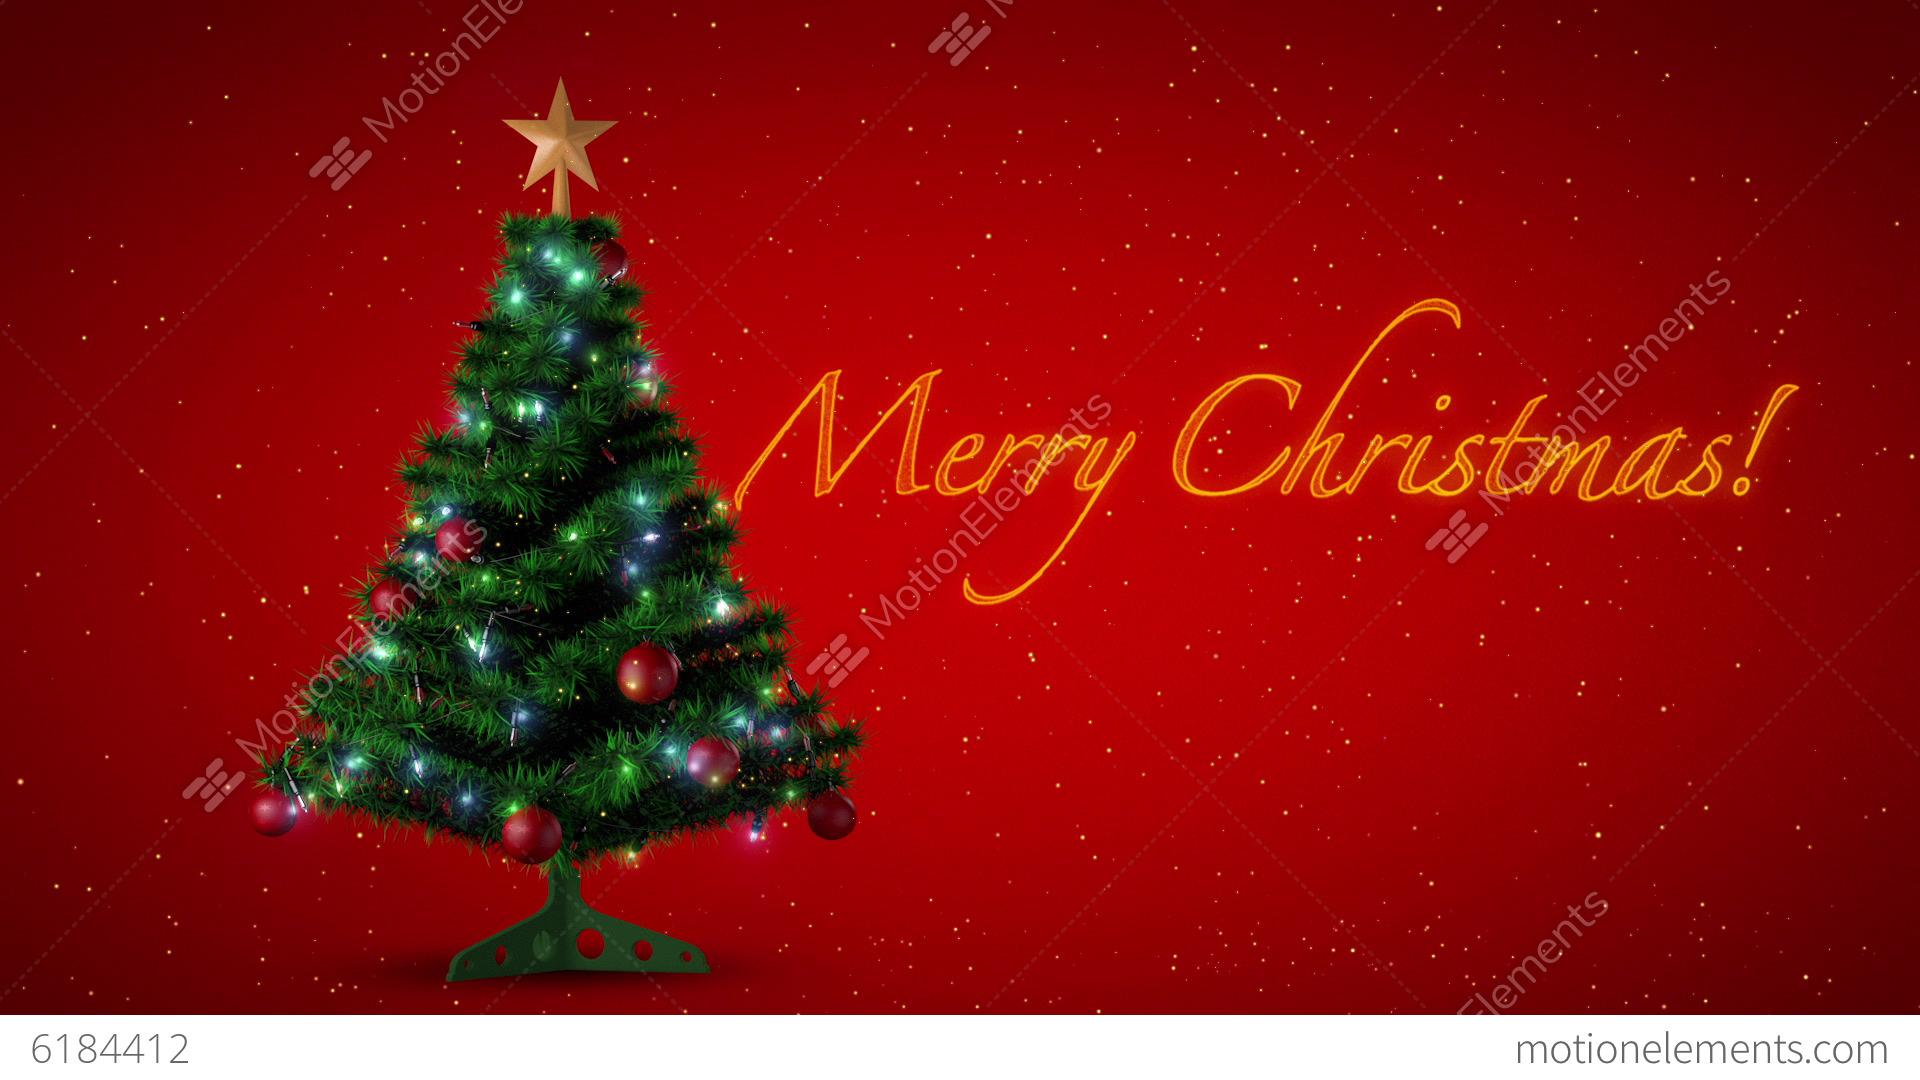 Christmas Tree With Merry Christmas Text Stock Animation